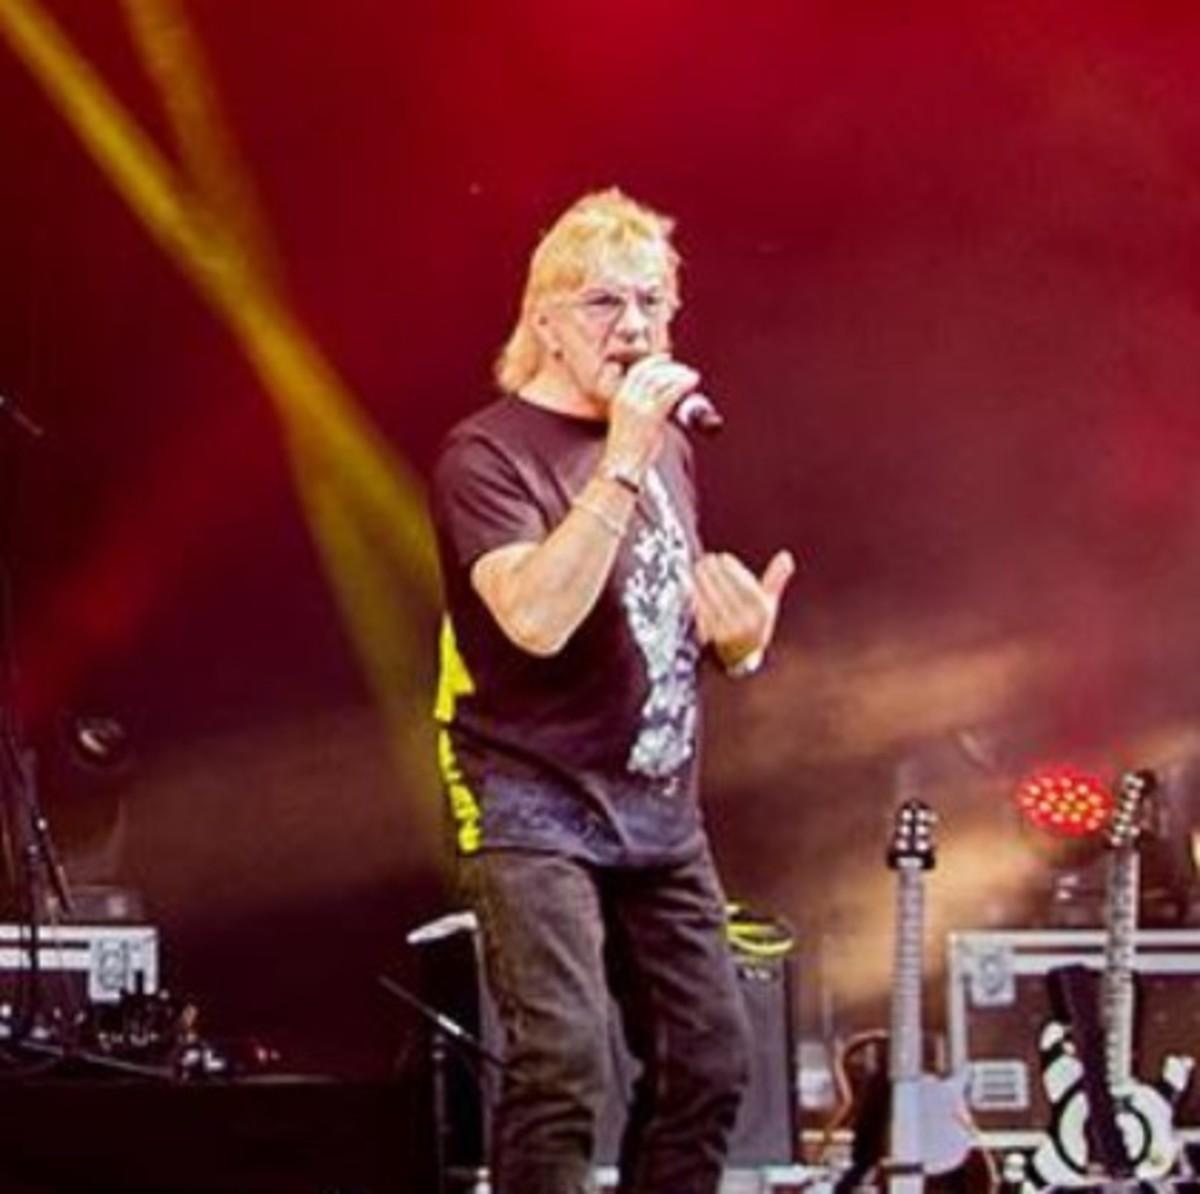 John Lawton, photo courtesy of lucifersfriend.com